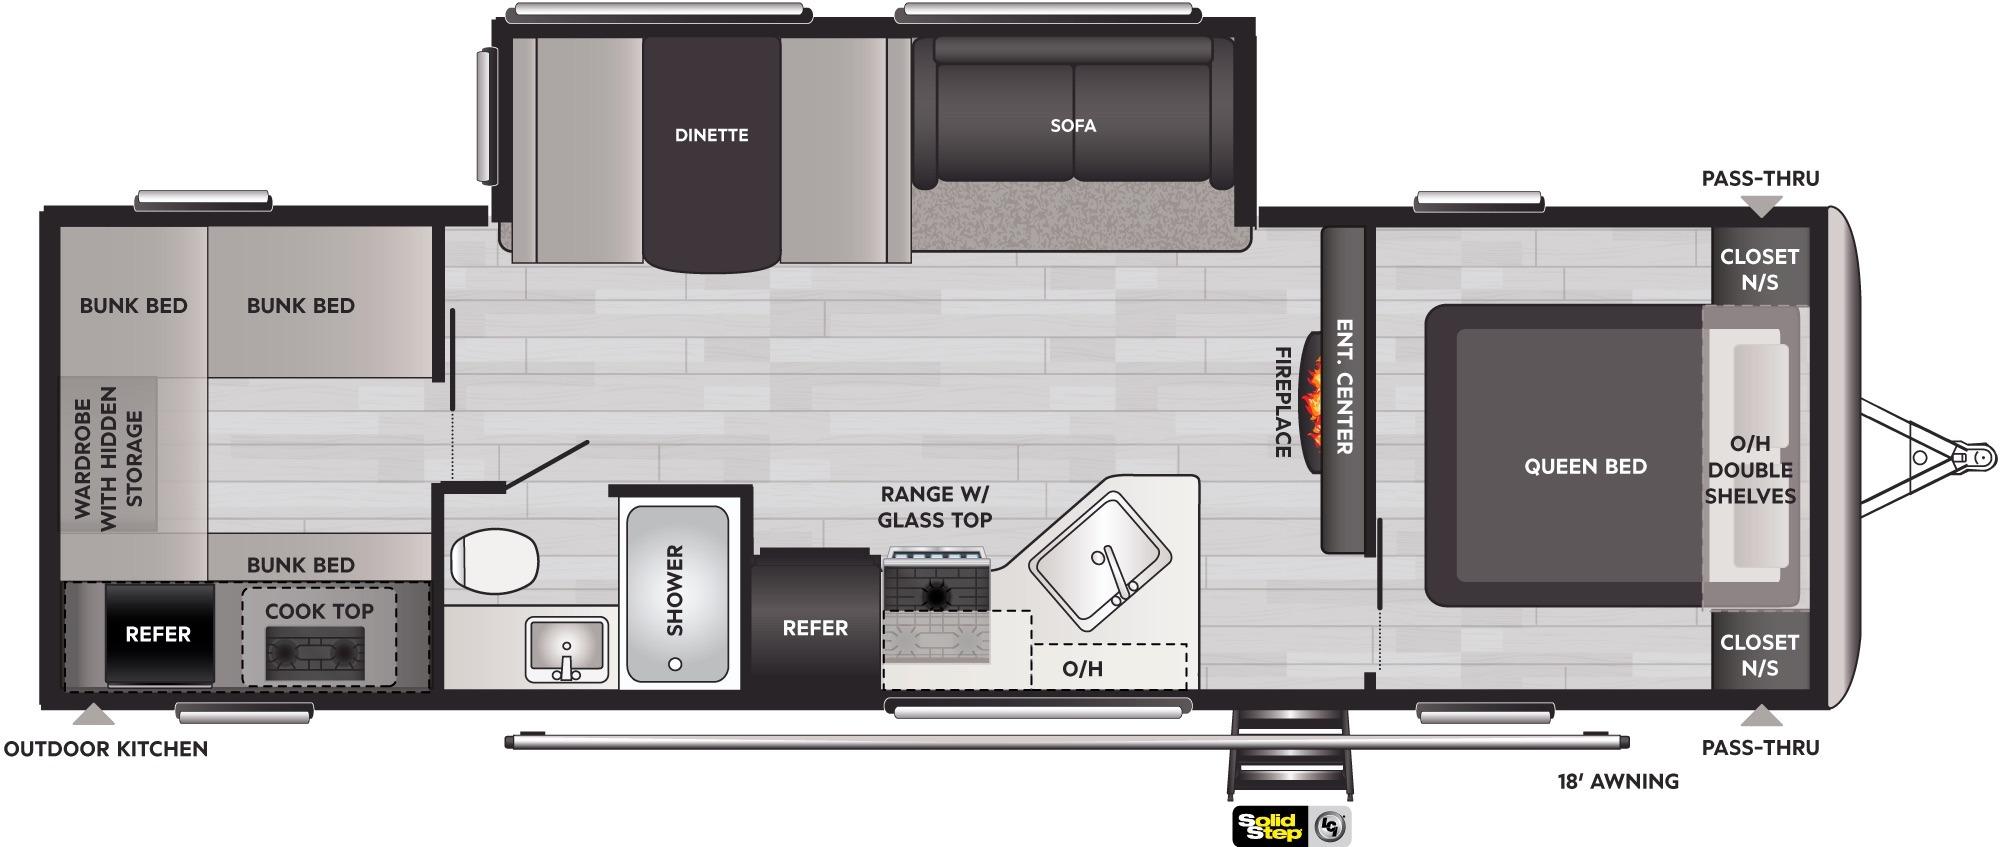 View Floor Plan for 2022 KEYSTONE SPRINGDALE 298BH